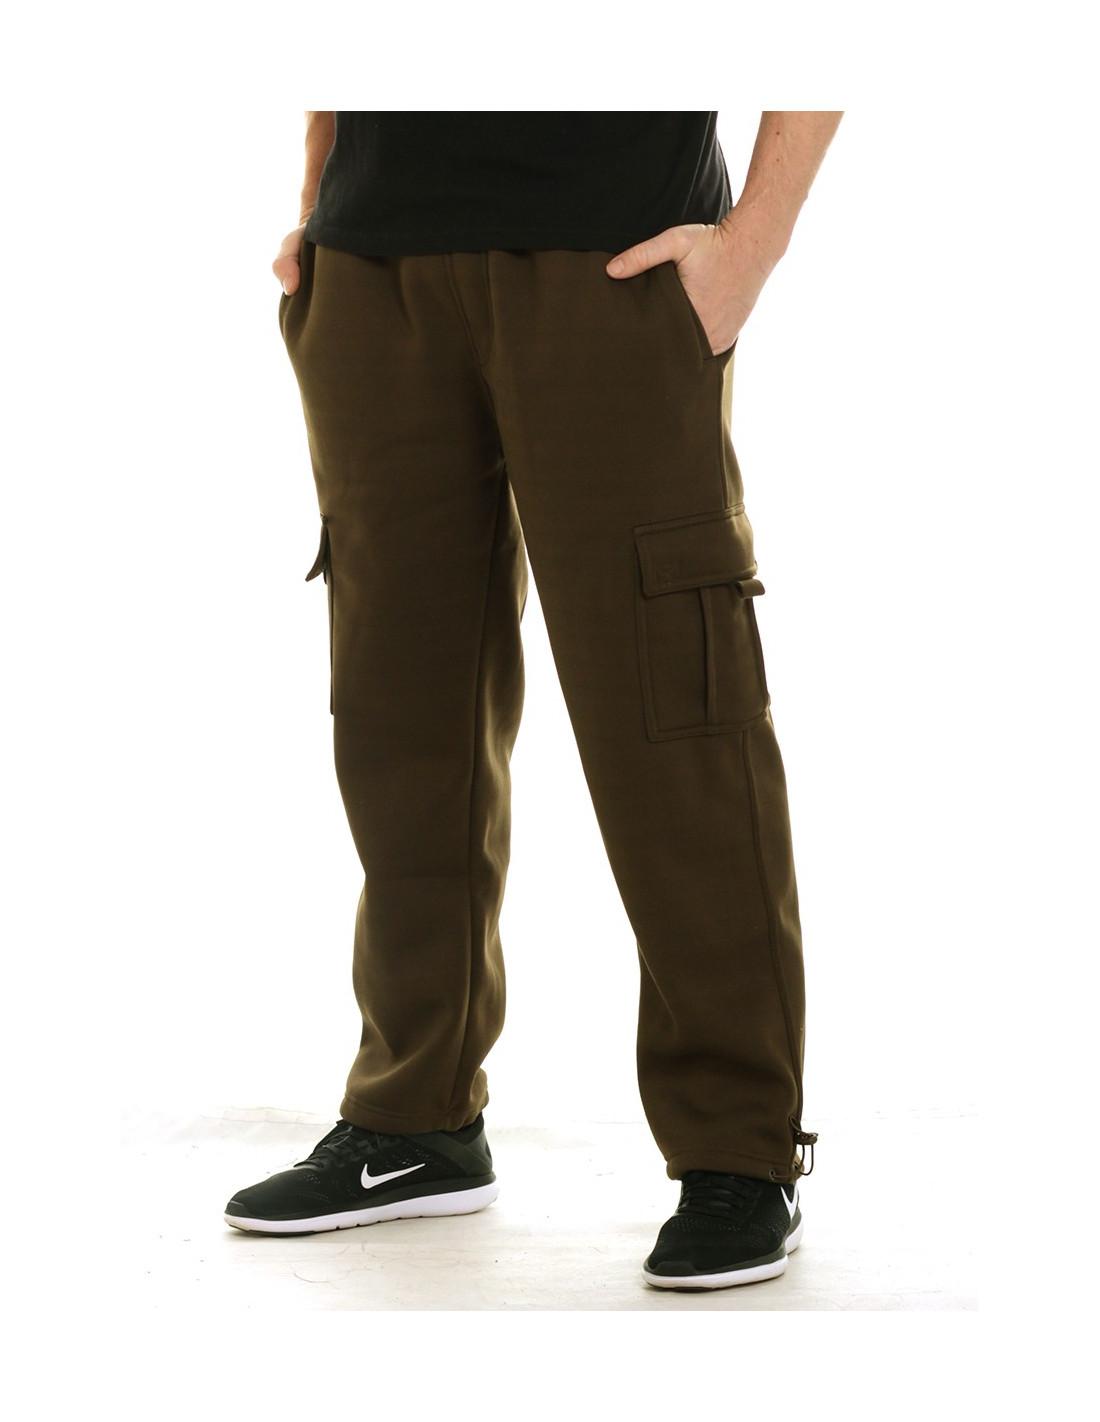 Access Cargo Sweatpants Olive